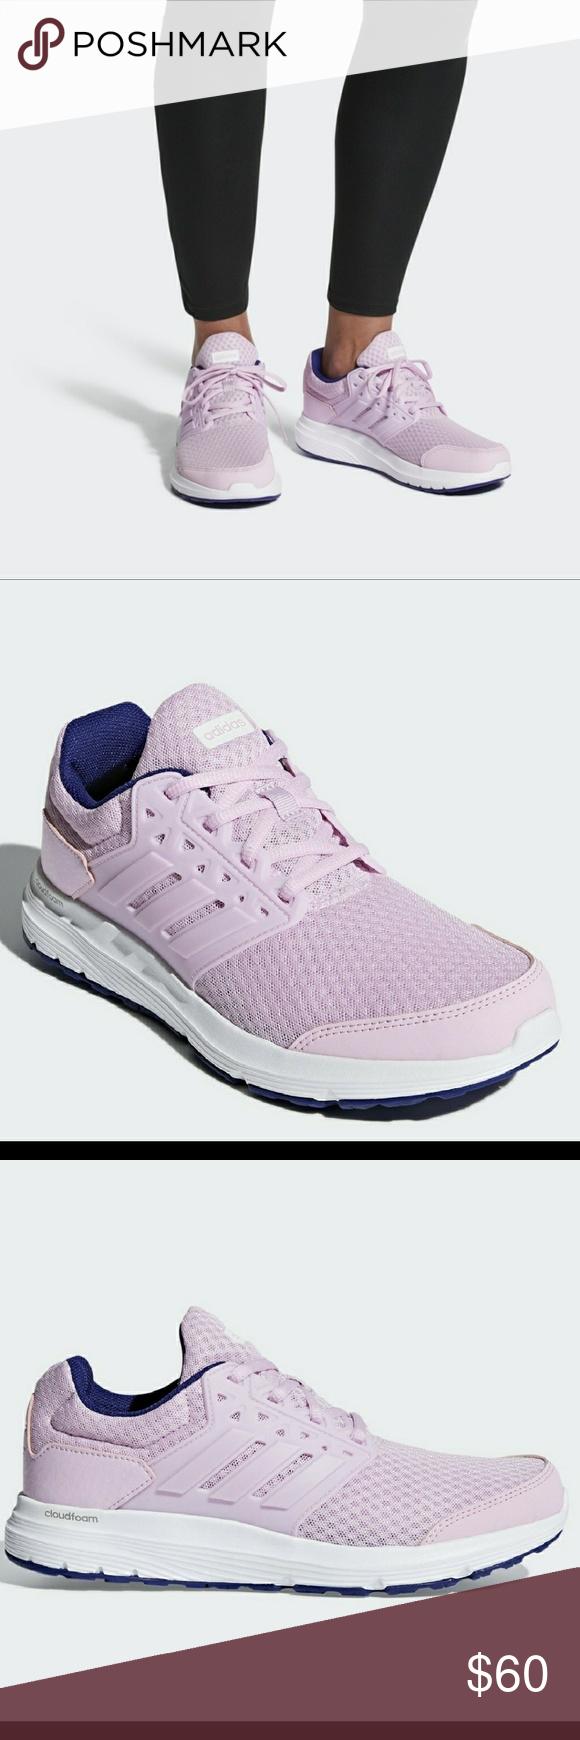 Adidas Galaxy 3 W Women Running Shoes